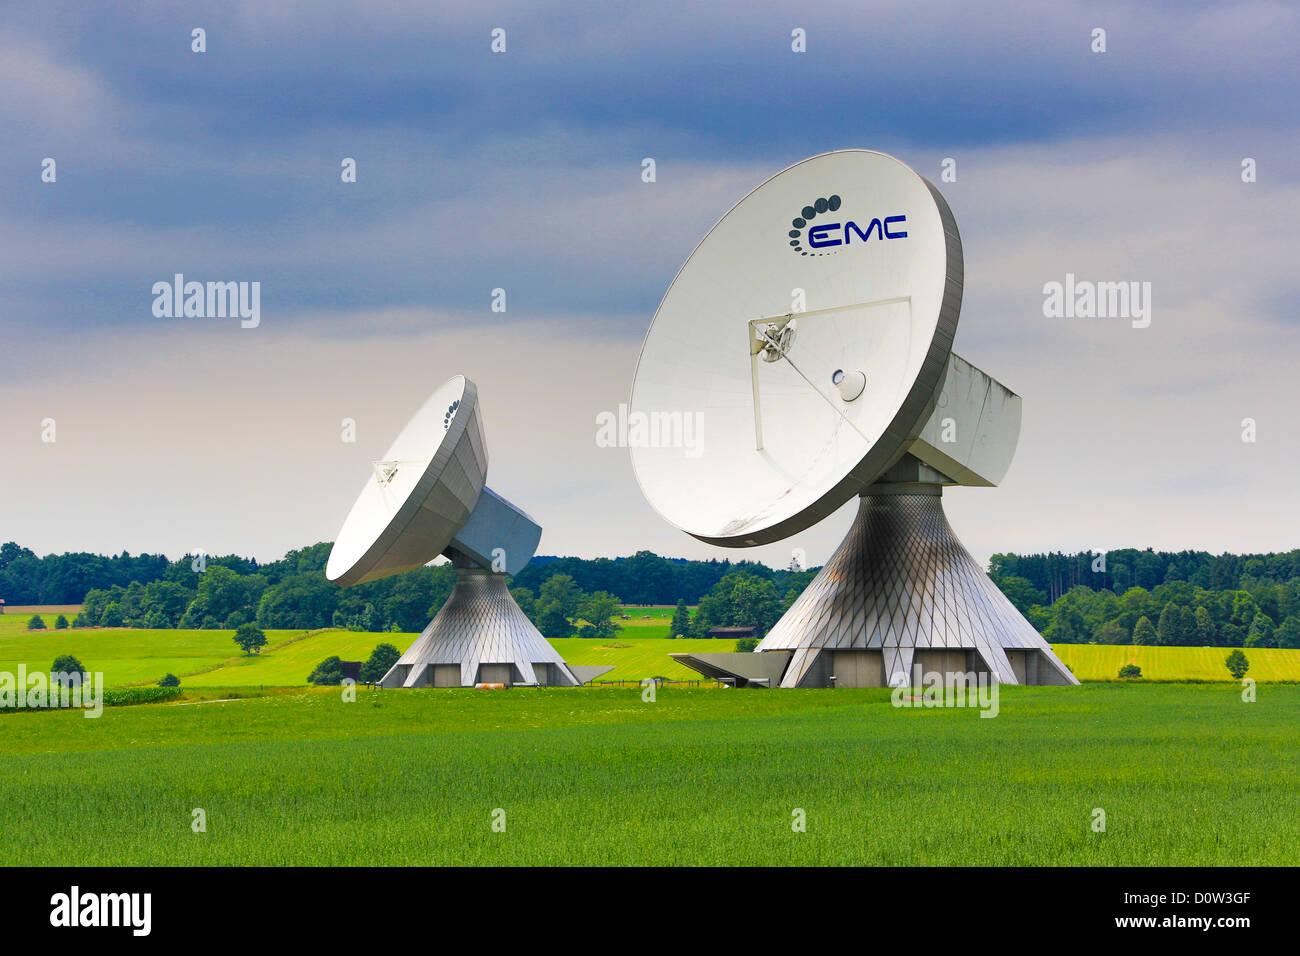 Deutschland, Europa, Reisen, Antennen, Garching, Bayern, bunte, Kommunikation, Radio, Technik Stockbild